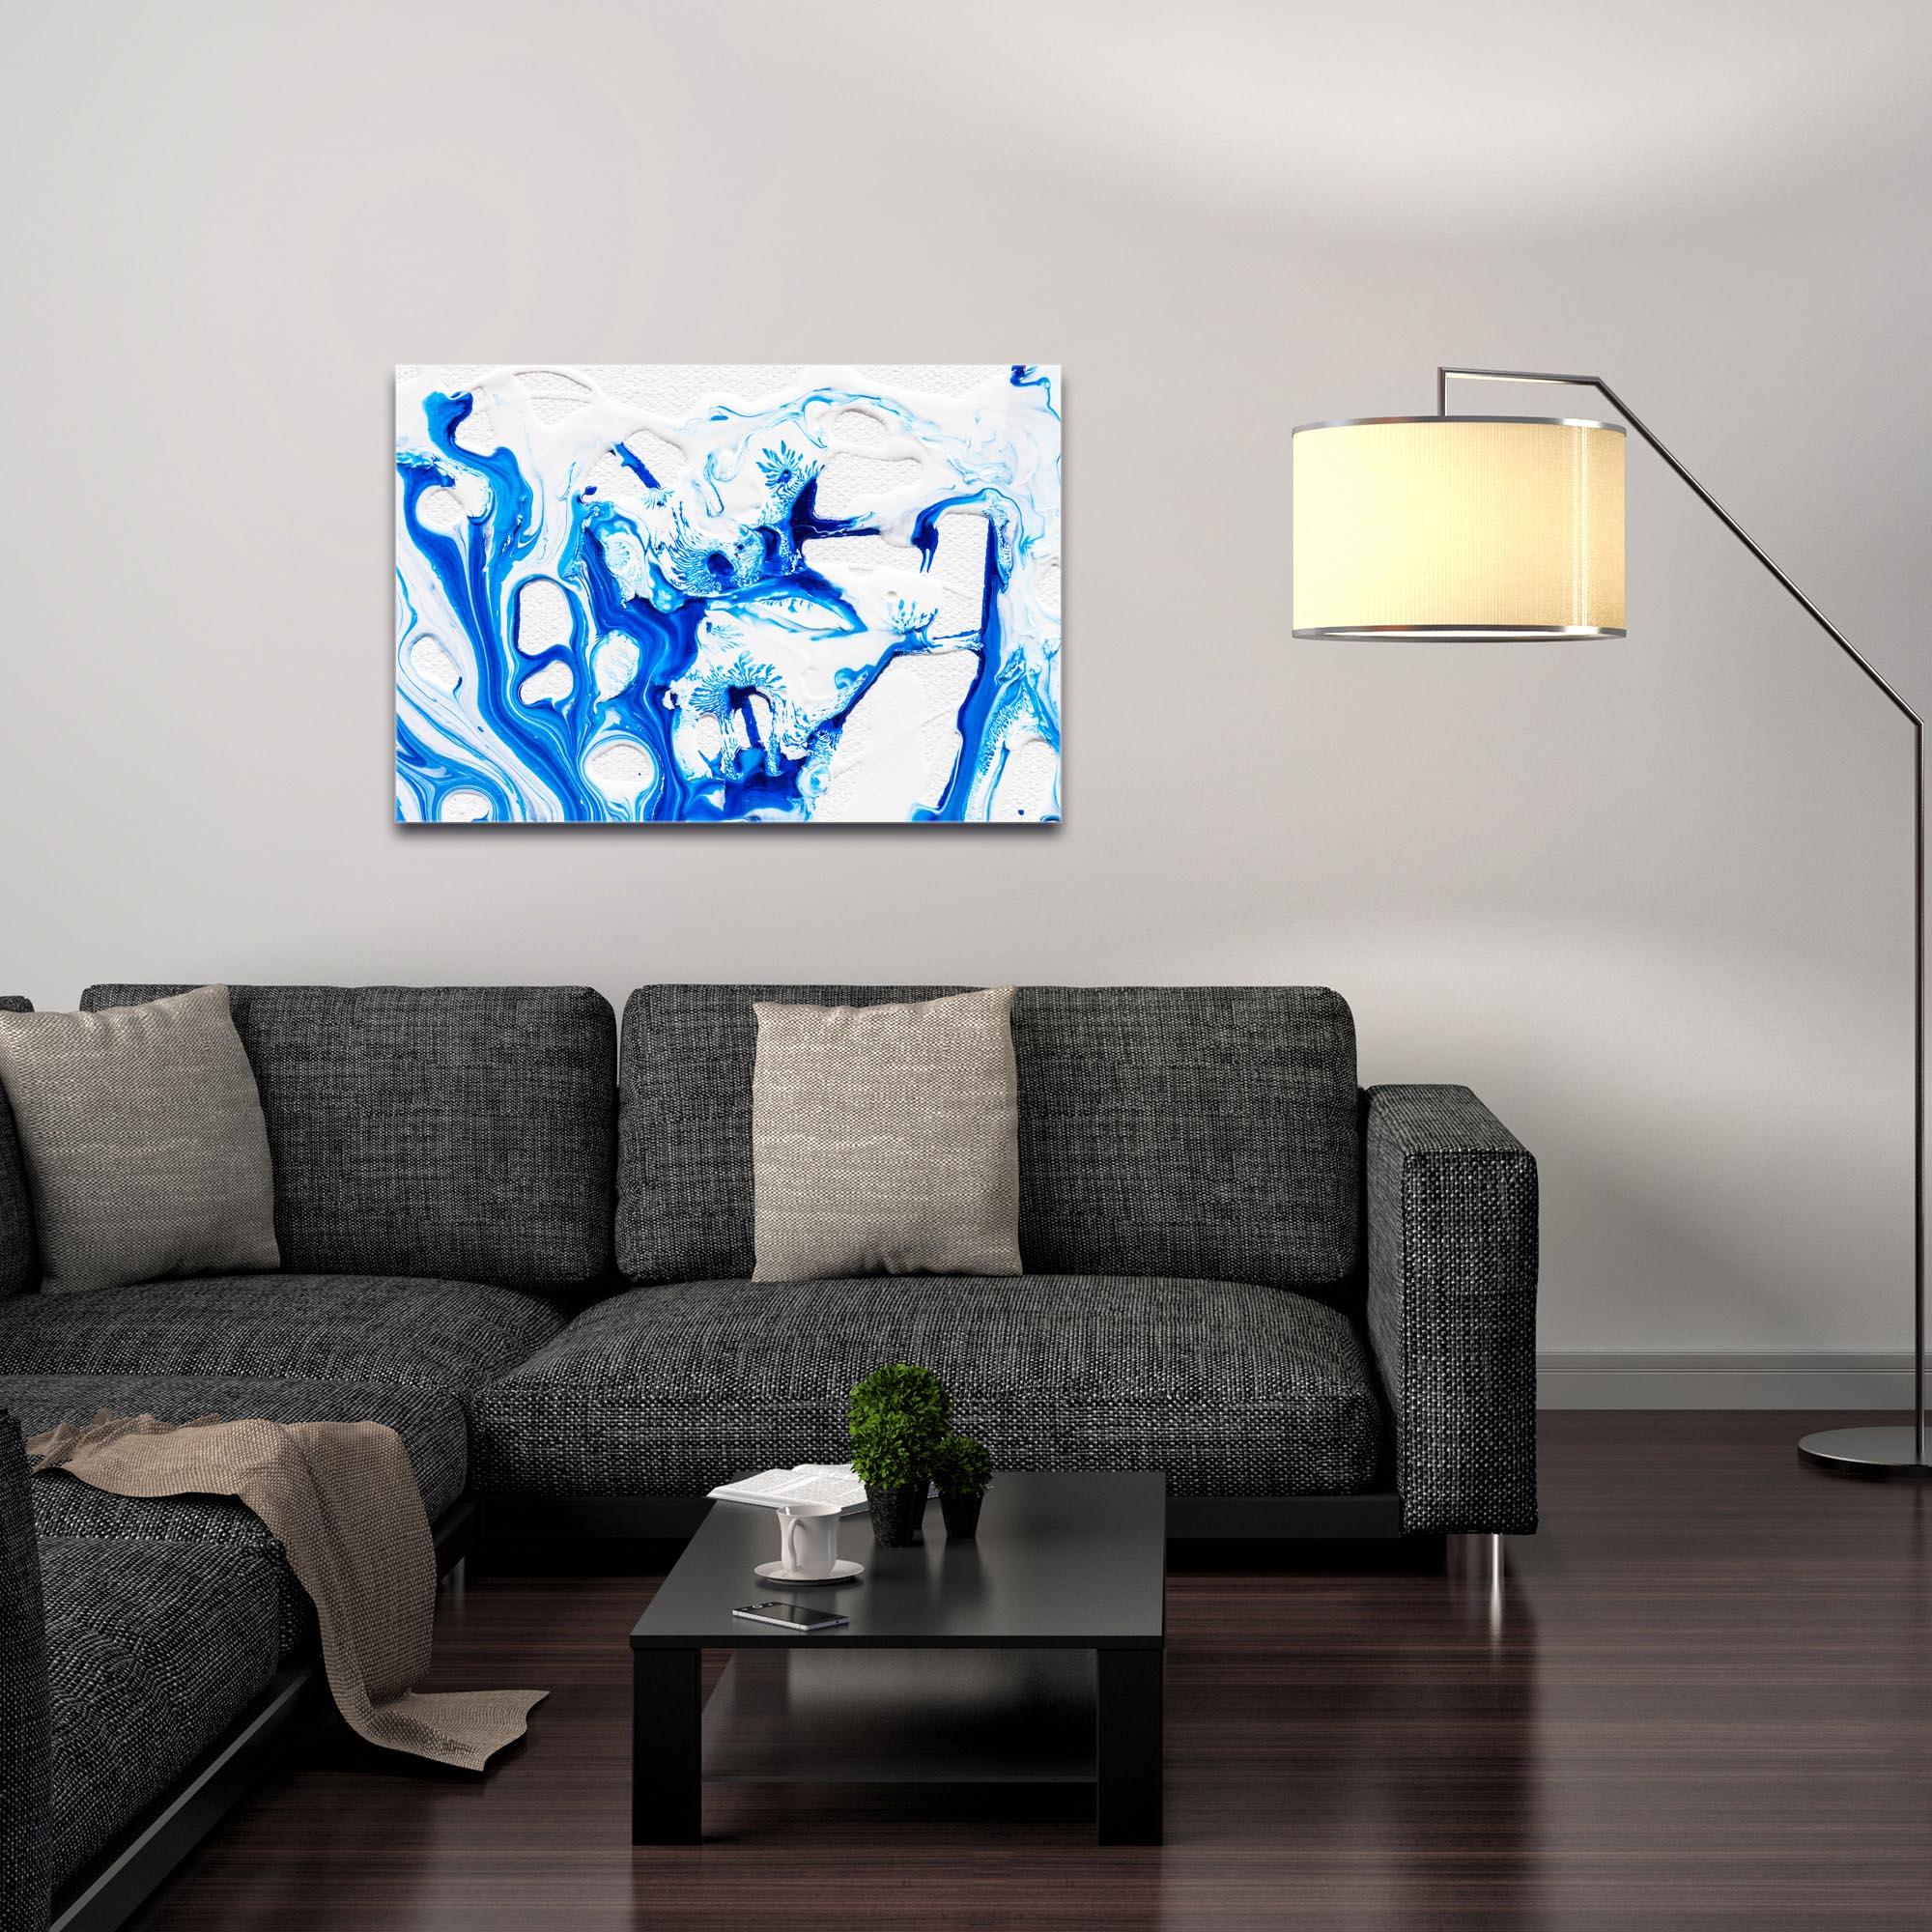 Abstract Wall Art 'Coastal Waters 3' - Colorful Urban Decor on Metal or Plexiglass - Image 3